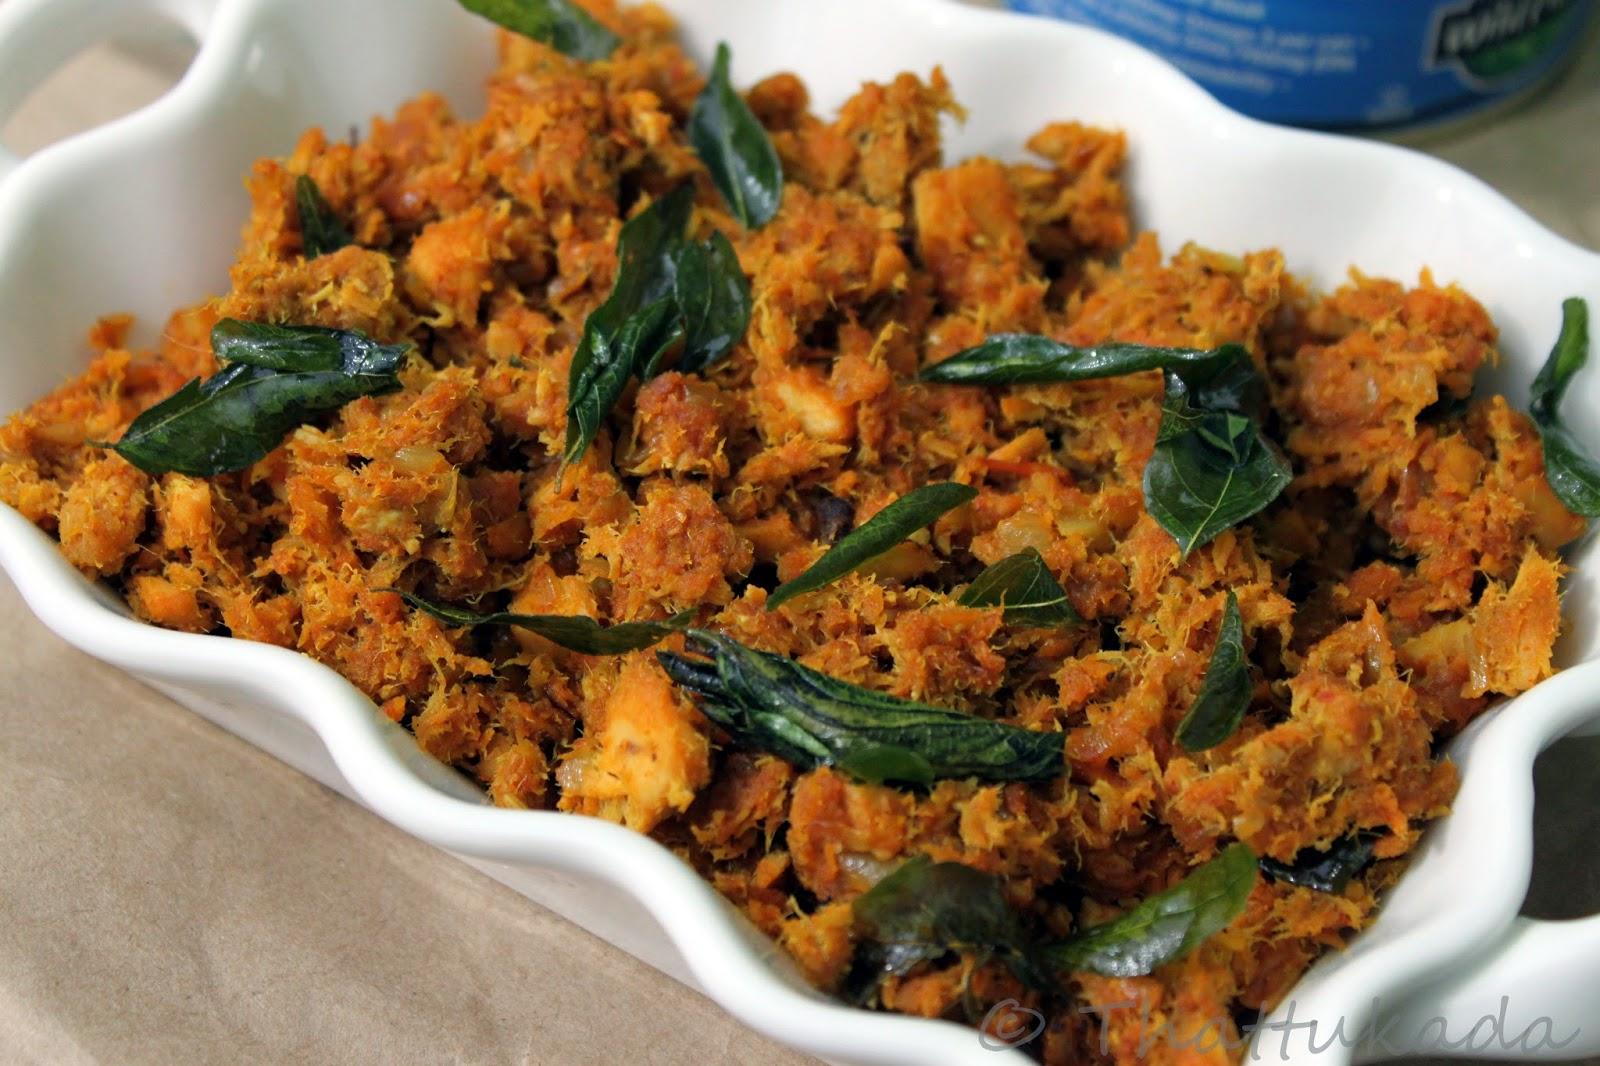 Canned tuna fish indian recipes food fish recipes for Tuna fish recipes